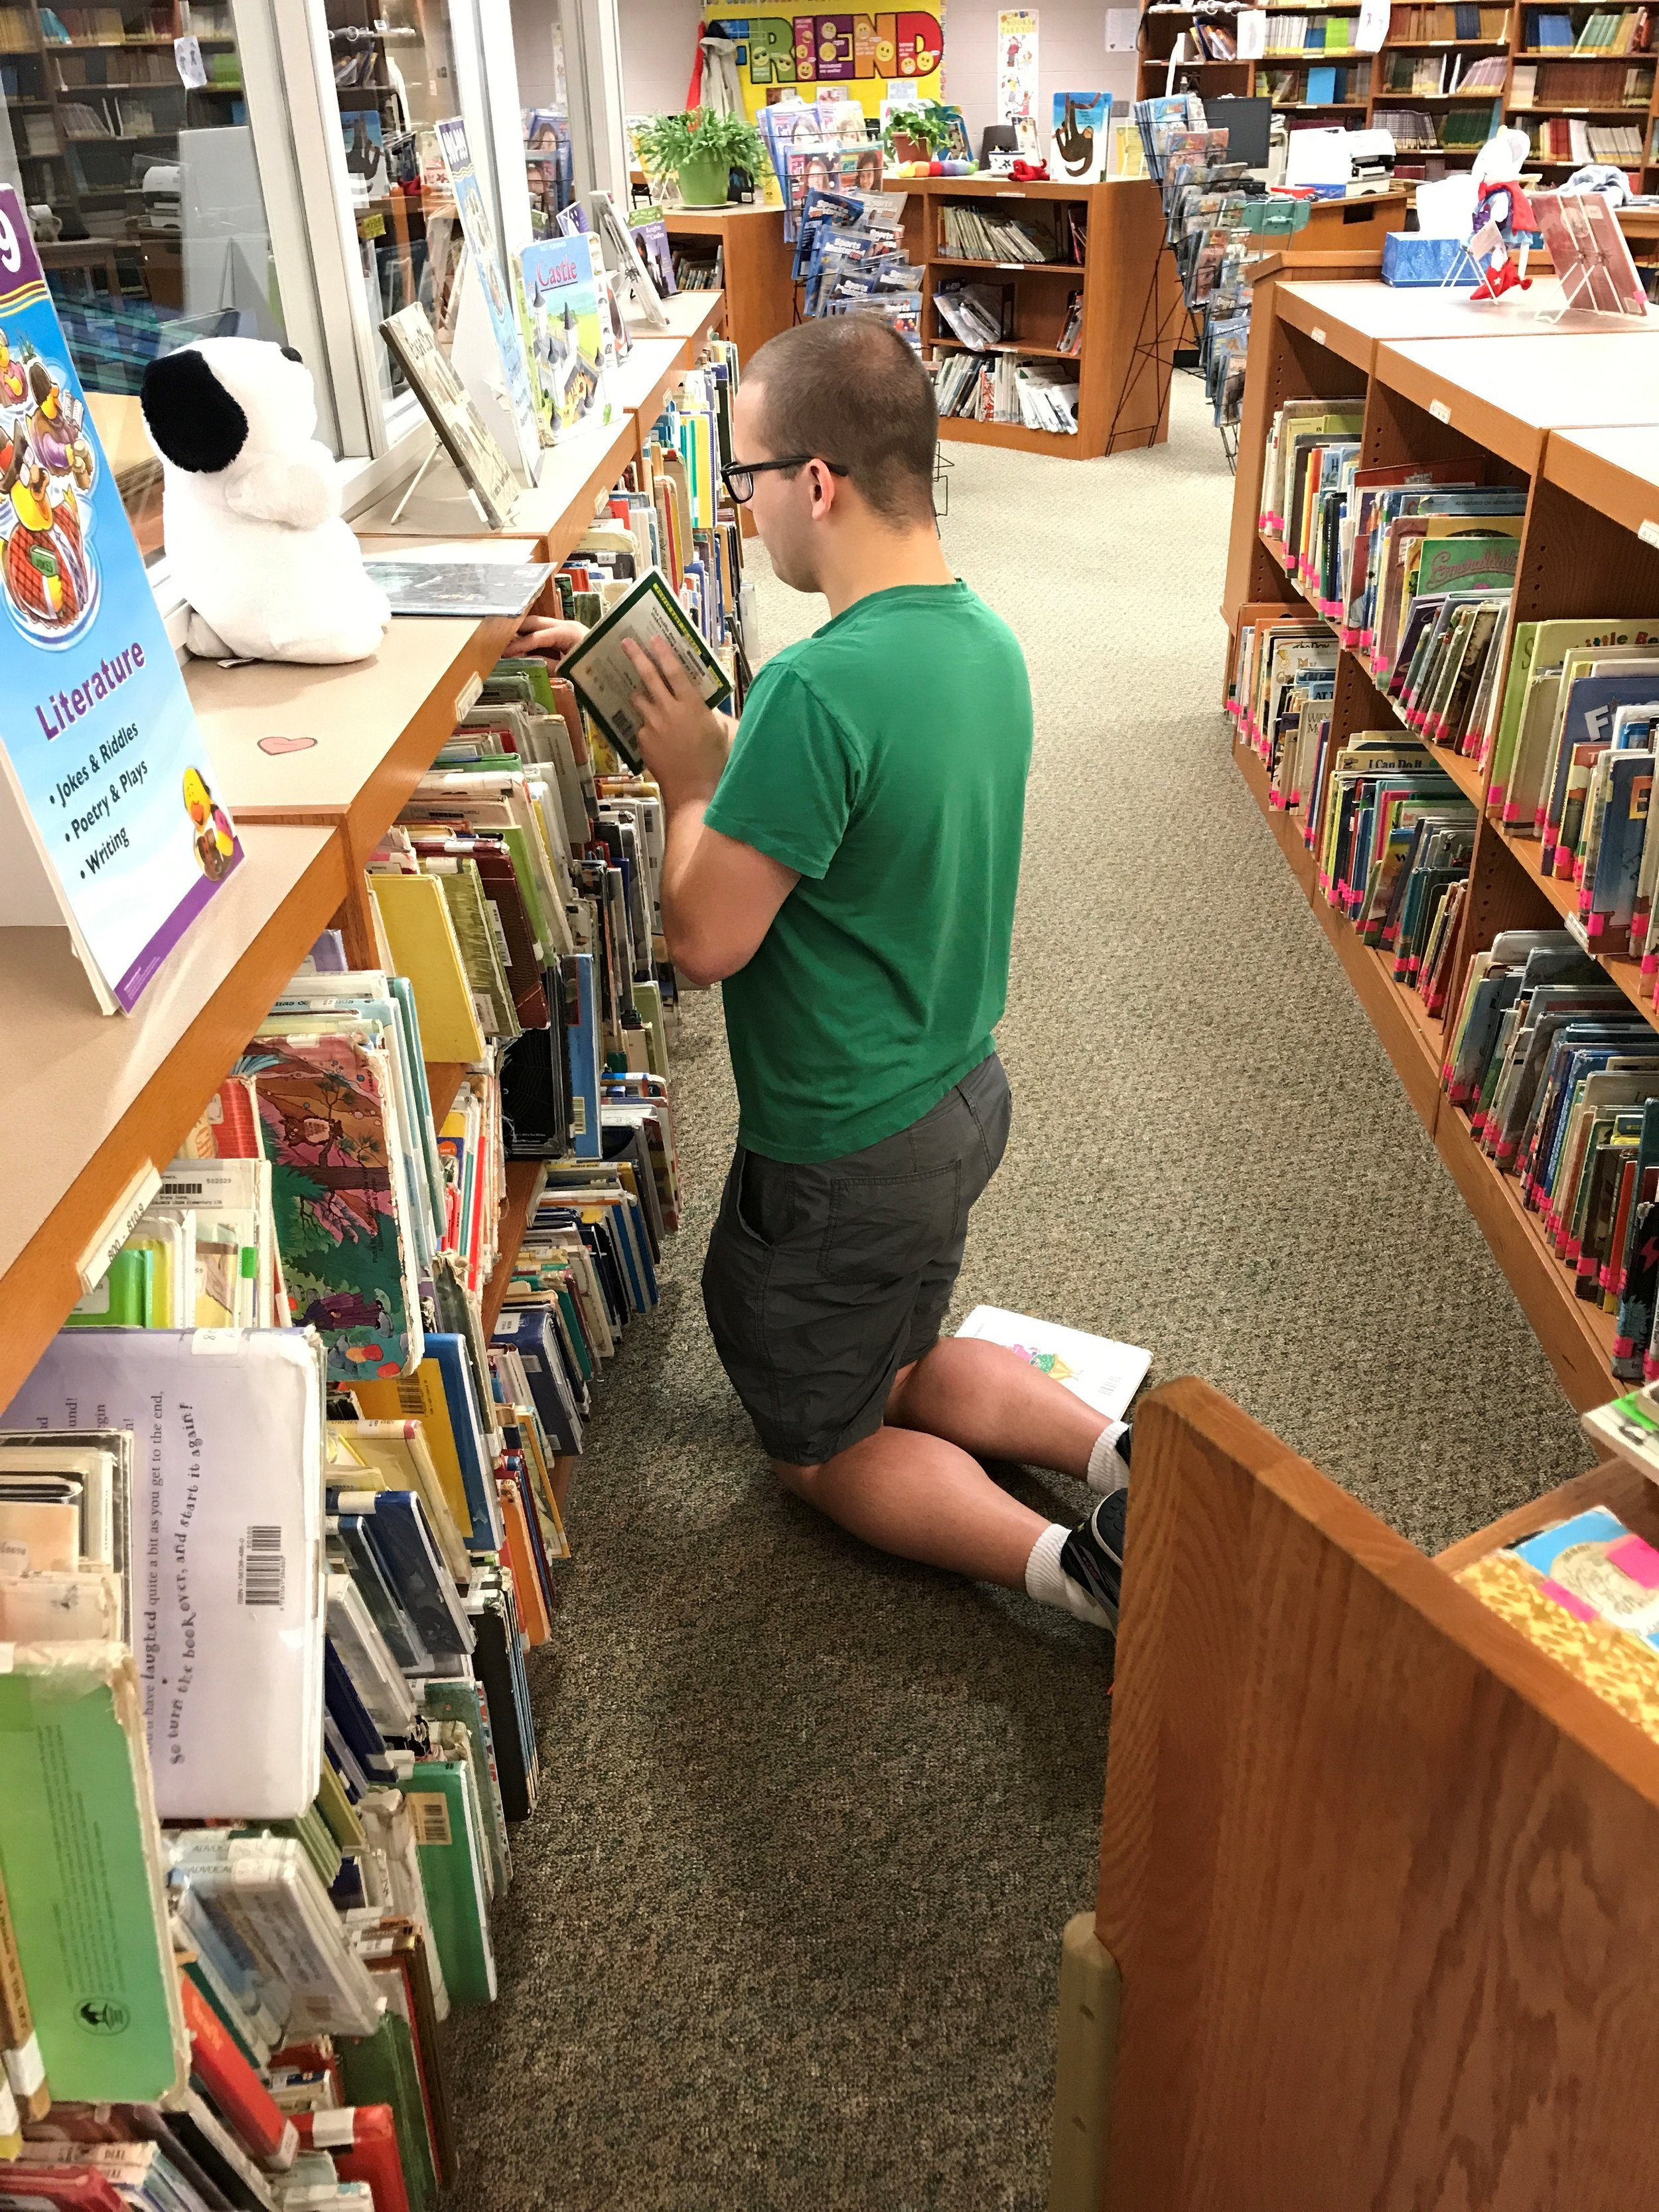 Trevor volunteering at the Library